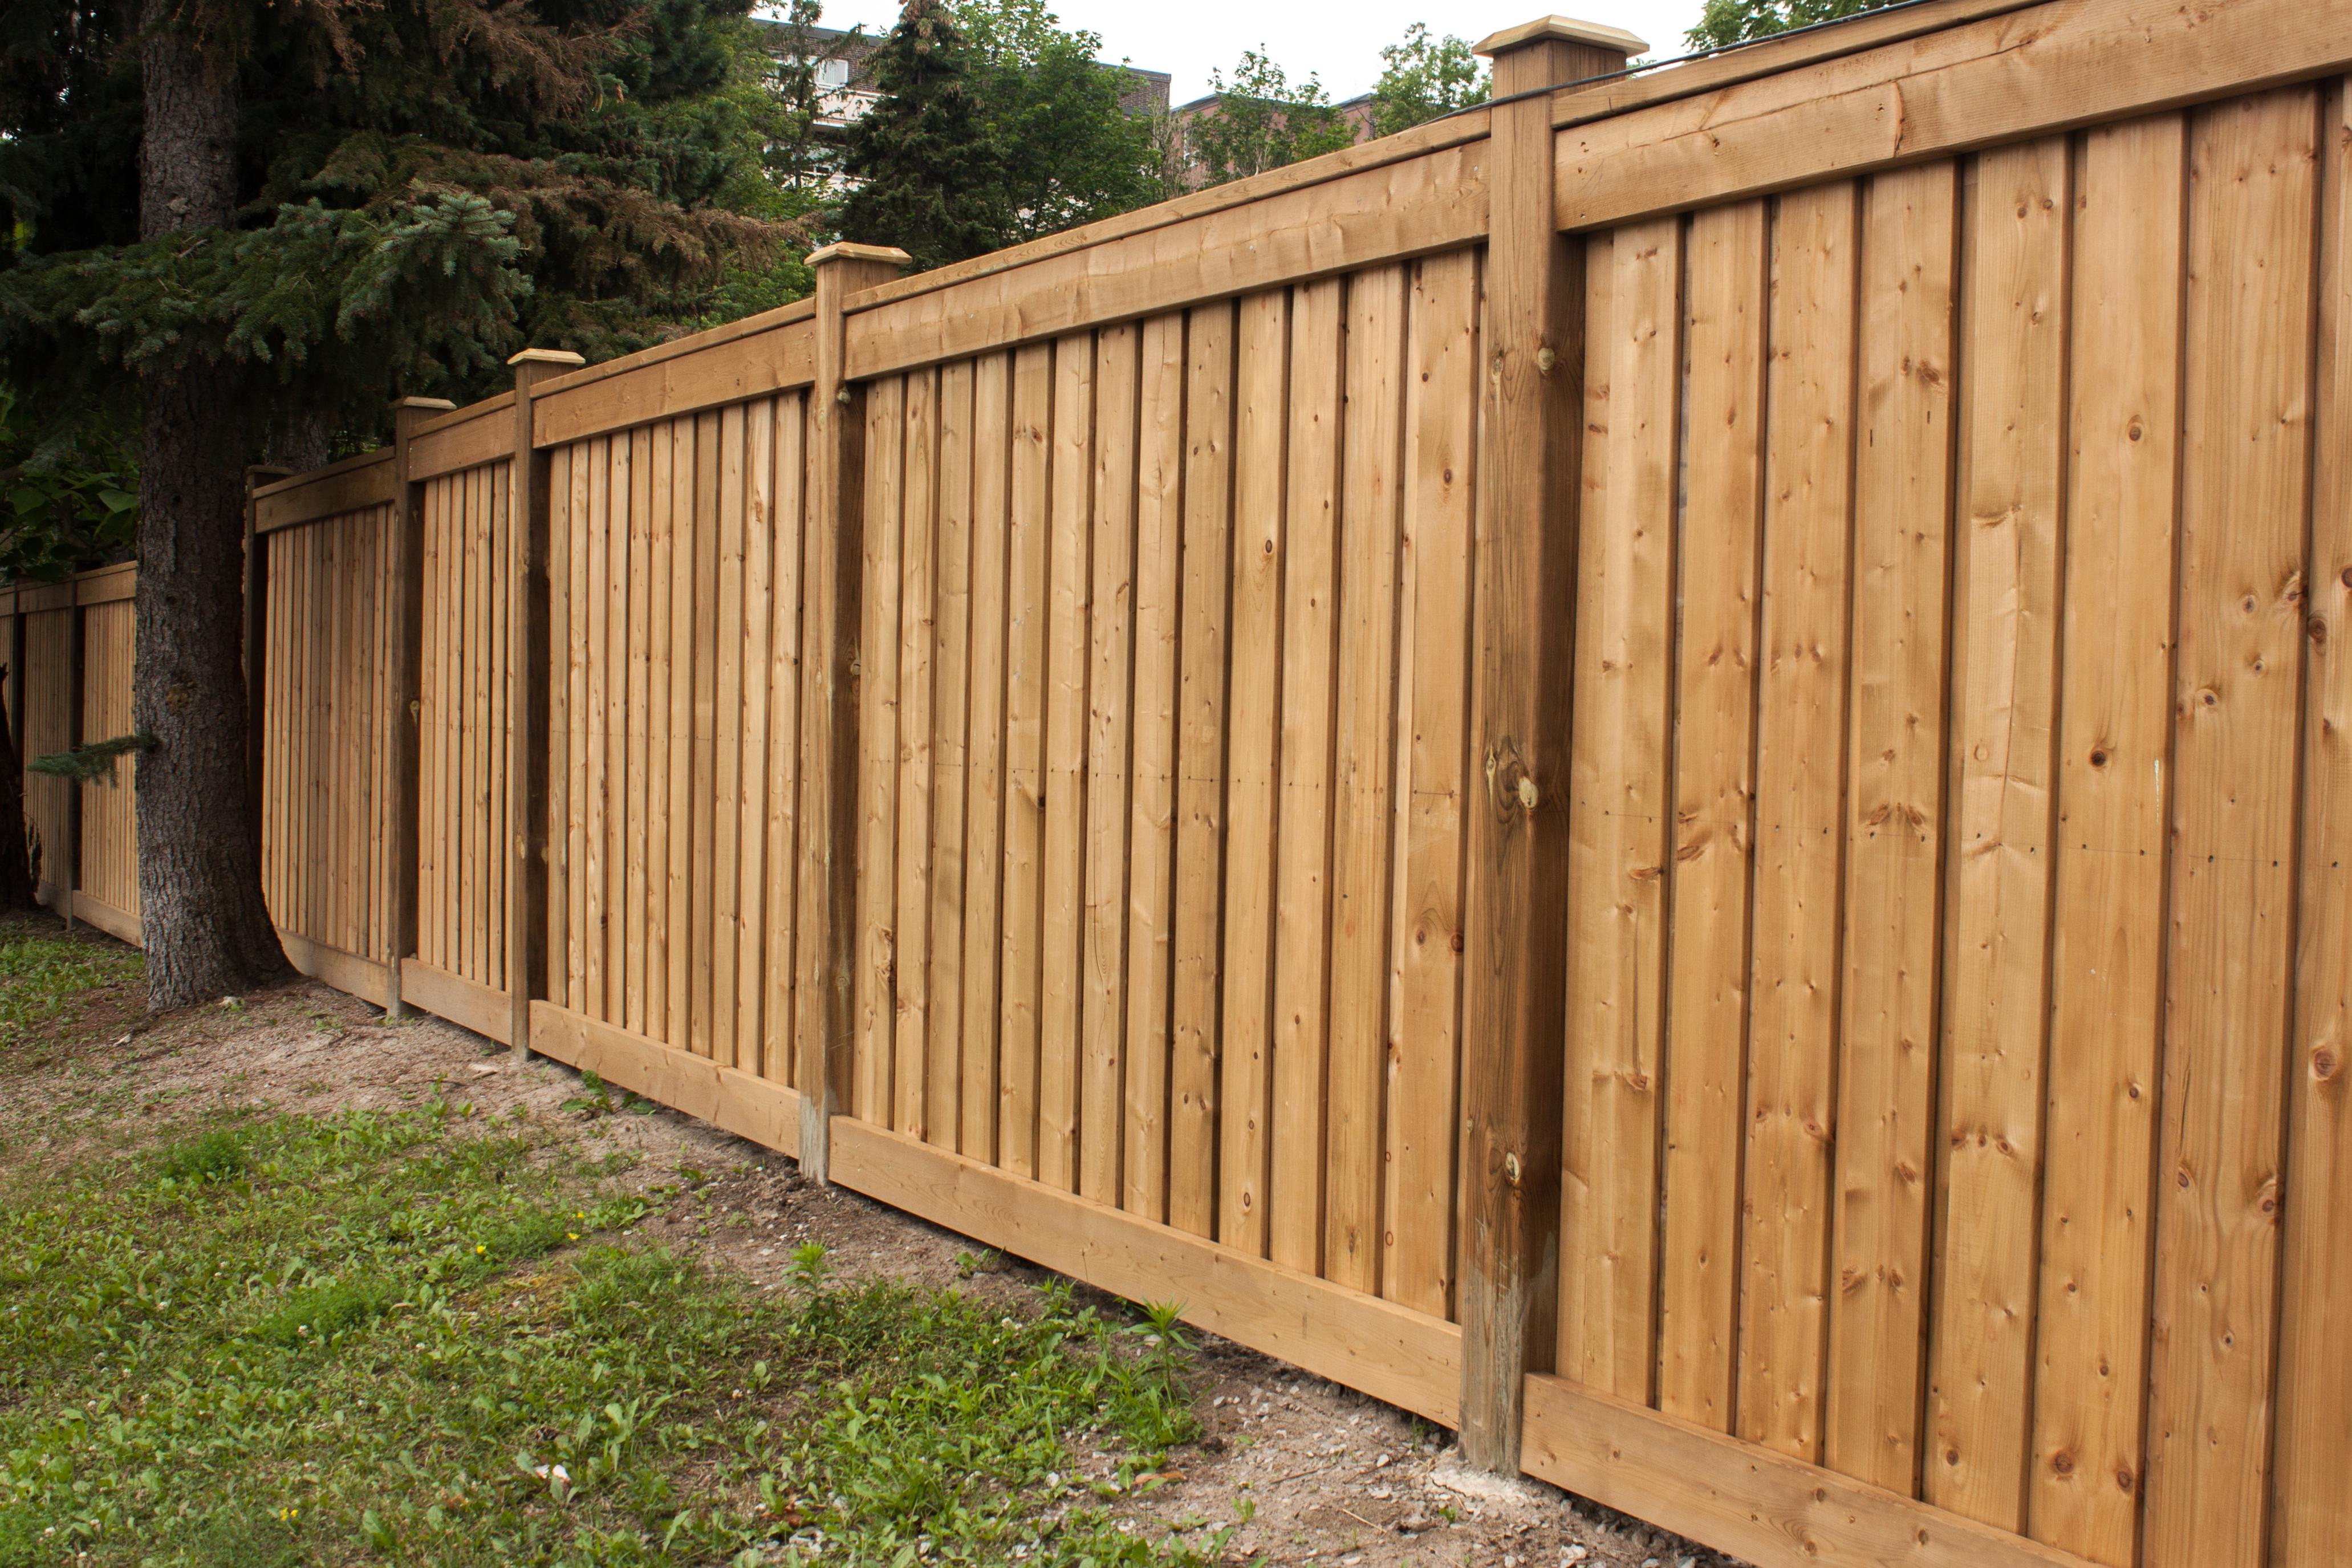 6×6 Fence Posts